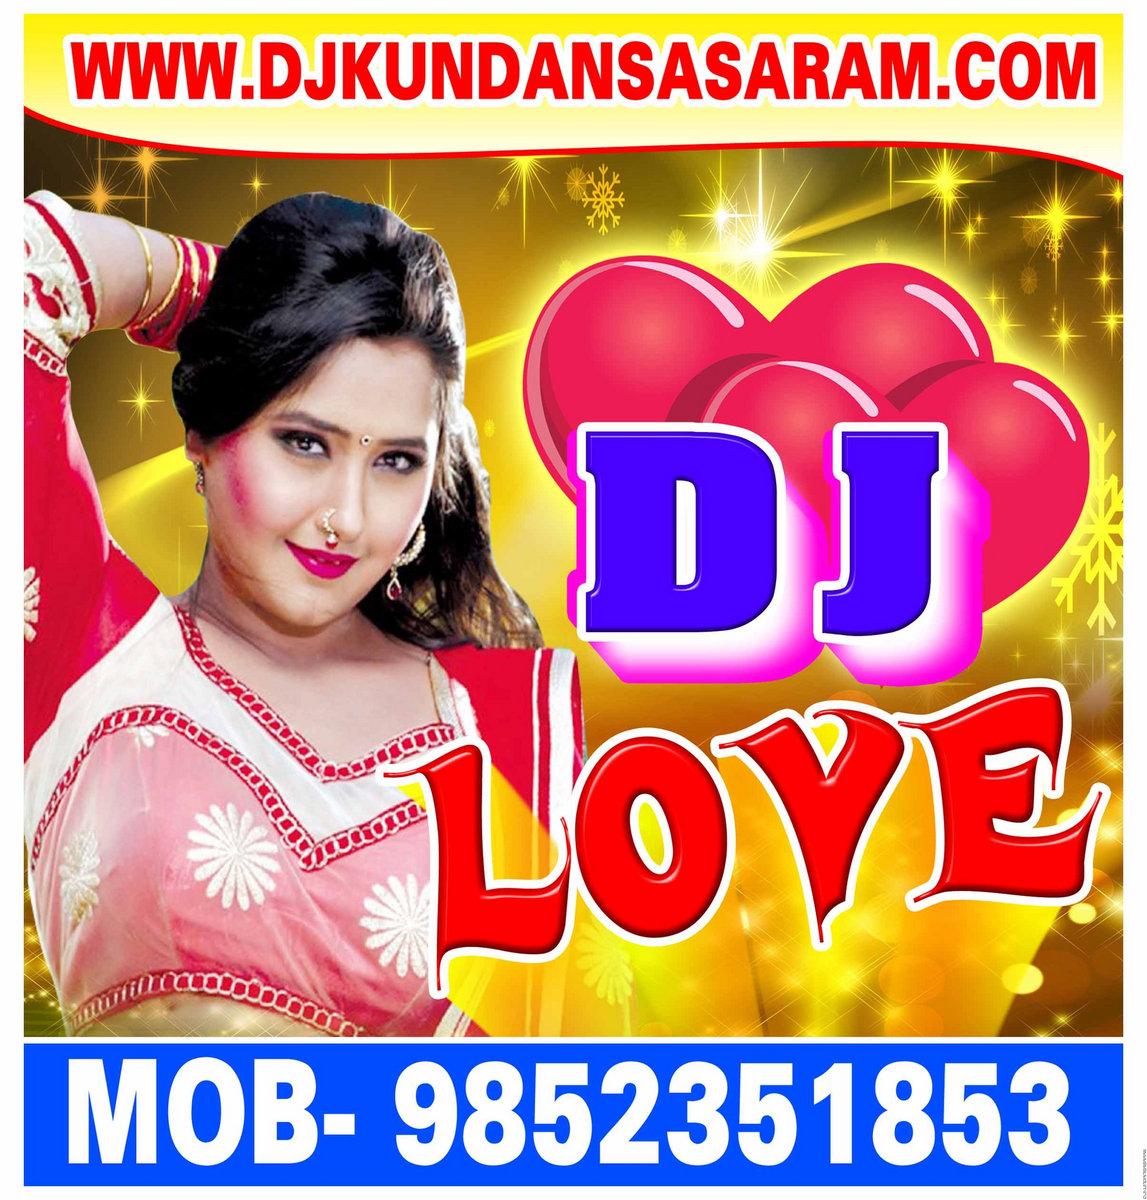 Latest movie download free mp4 | Bollywood Movies download, Hindi hd